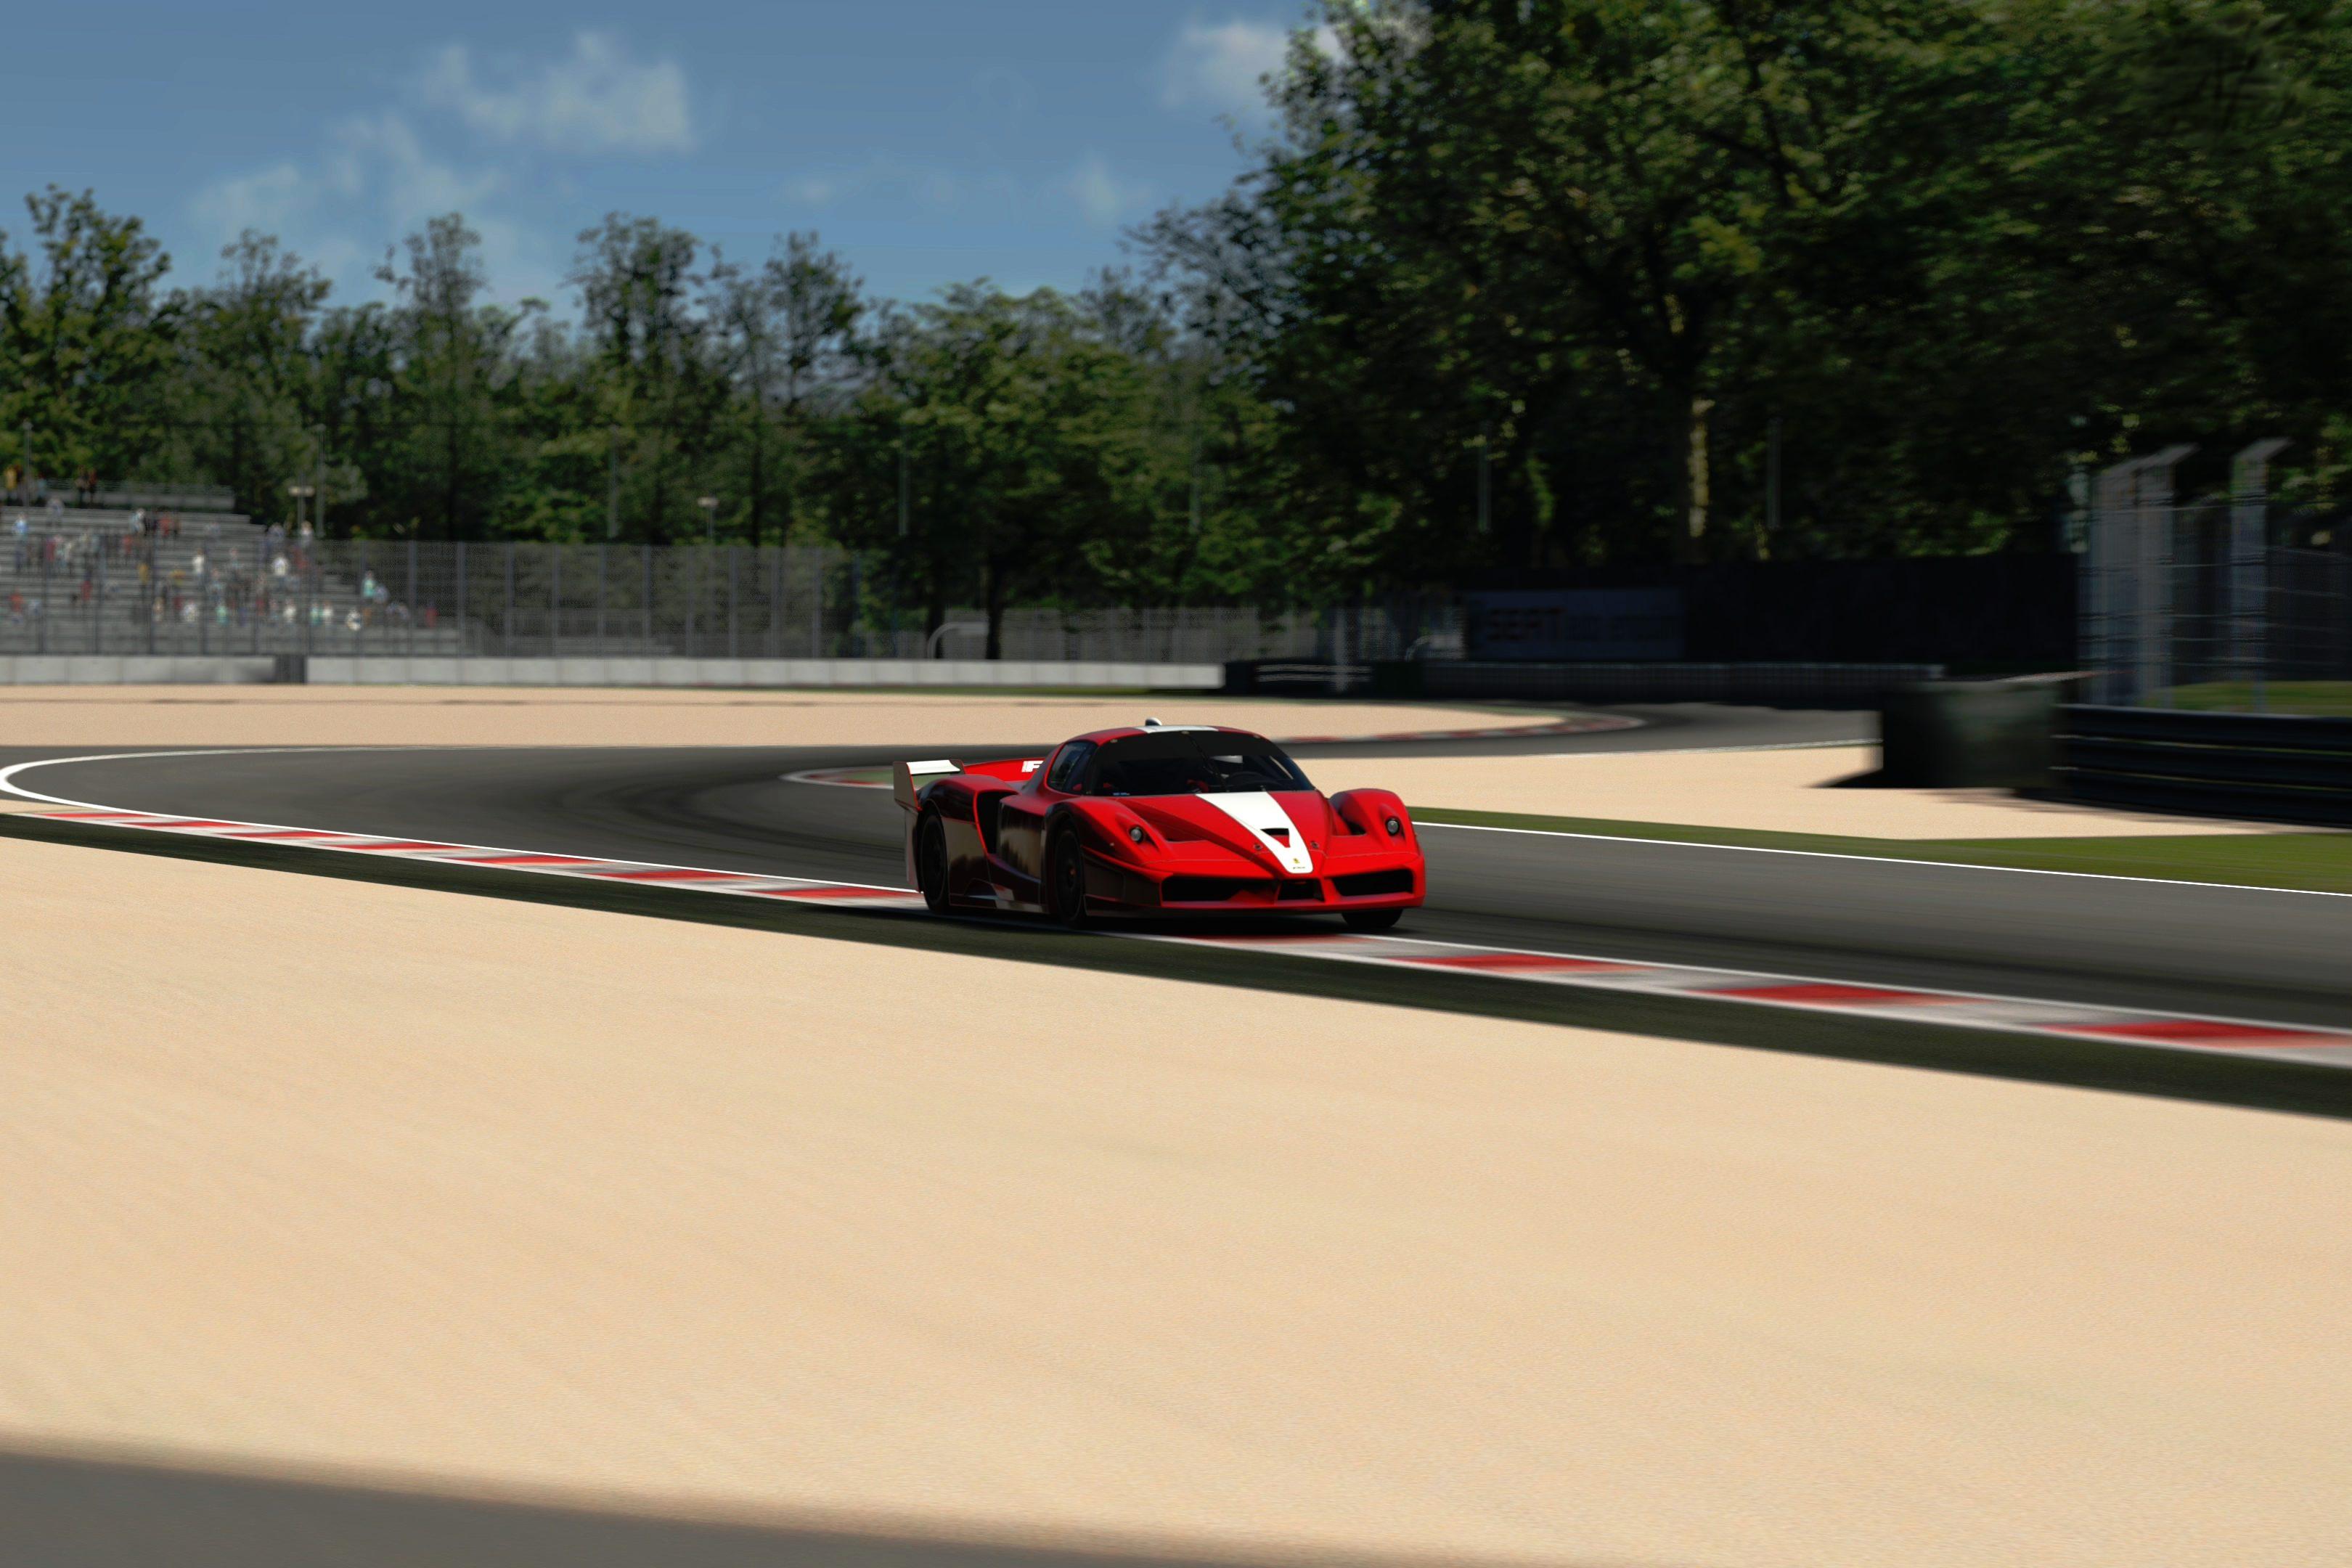 Autodromo Nazionale Monza_1-1.jpg